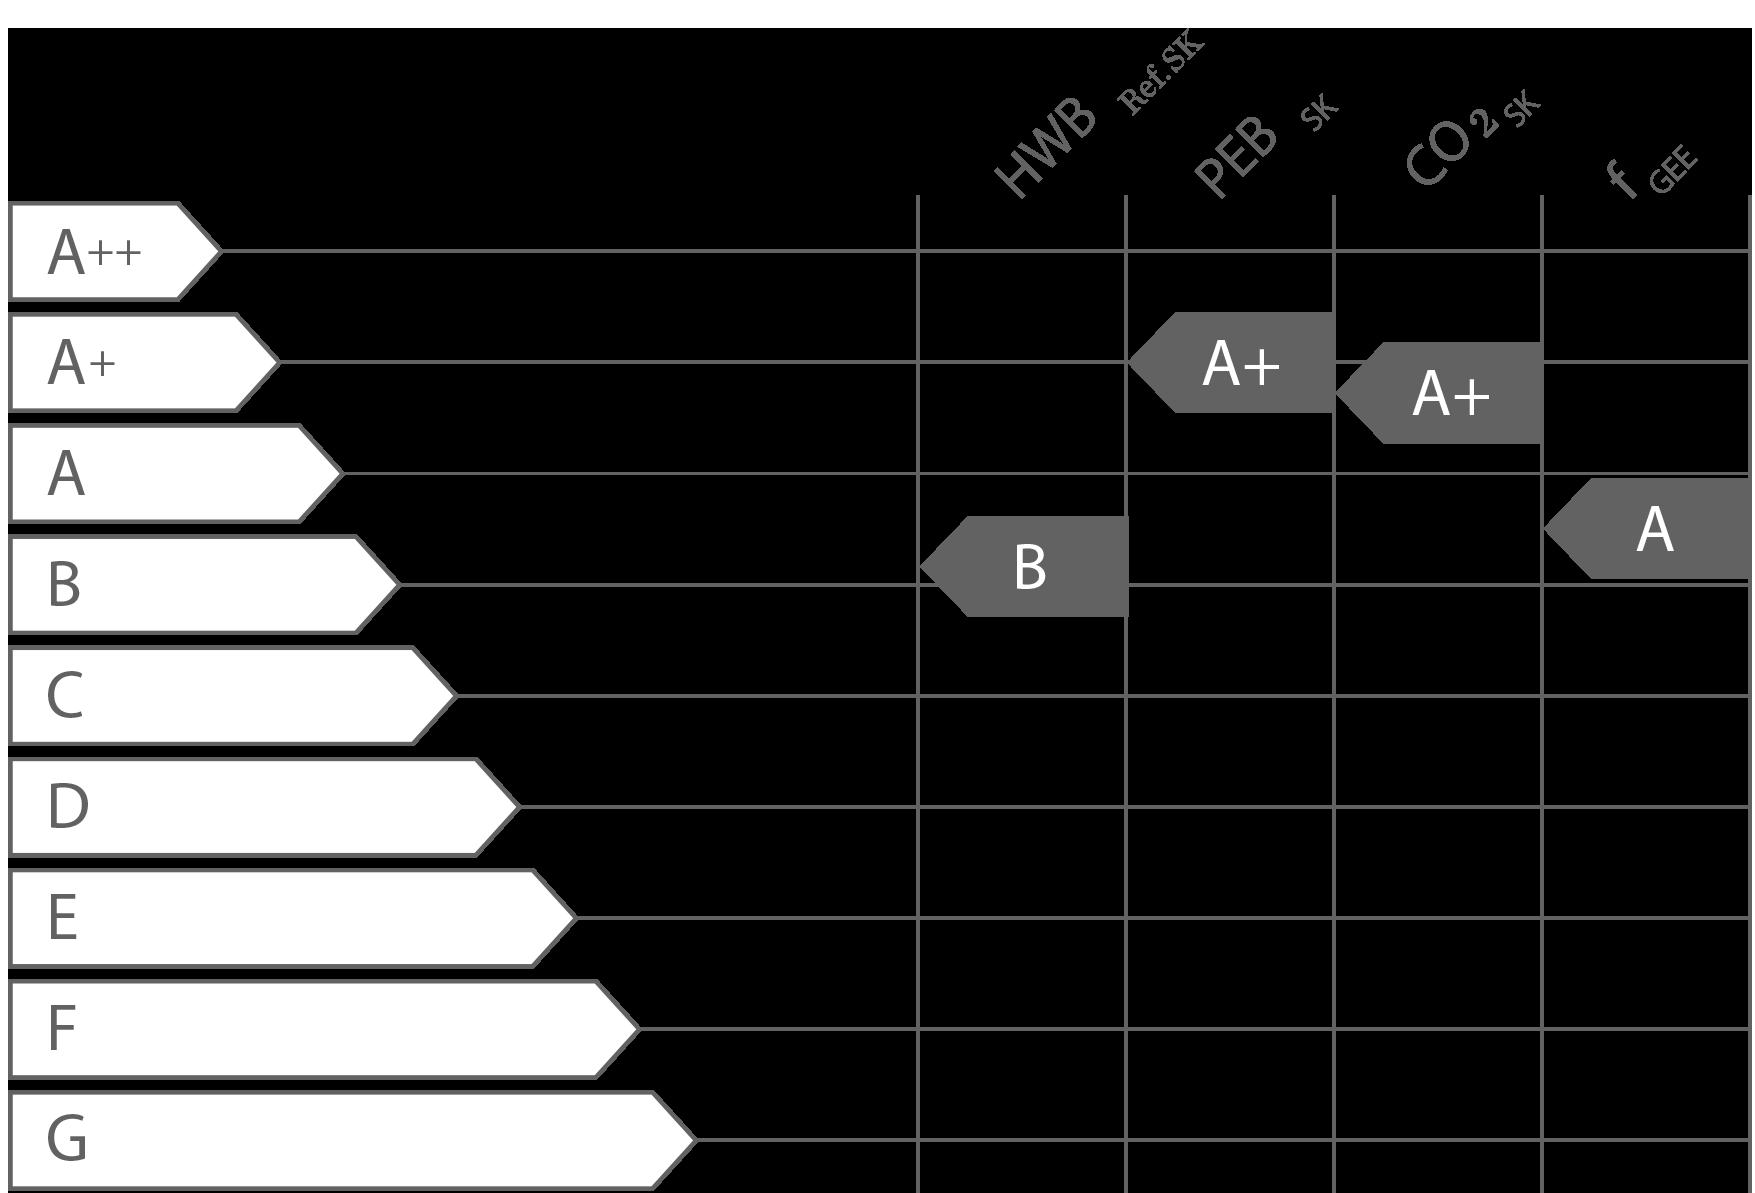 Energieeffizienz gemäß Energieausweis